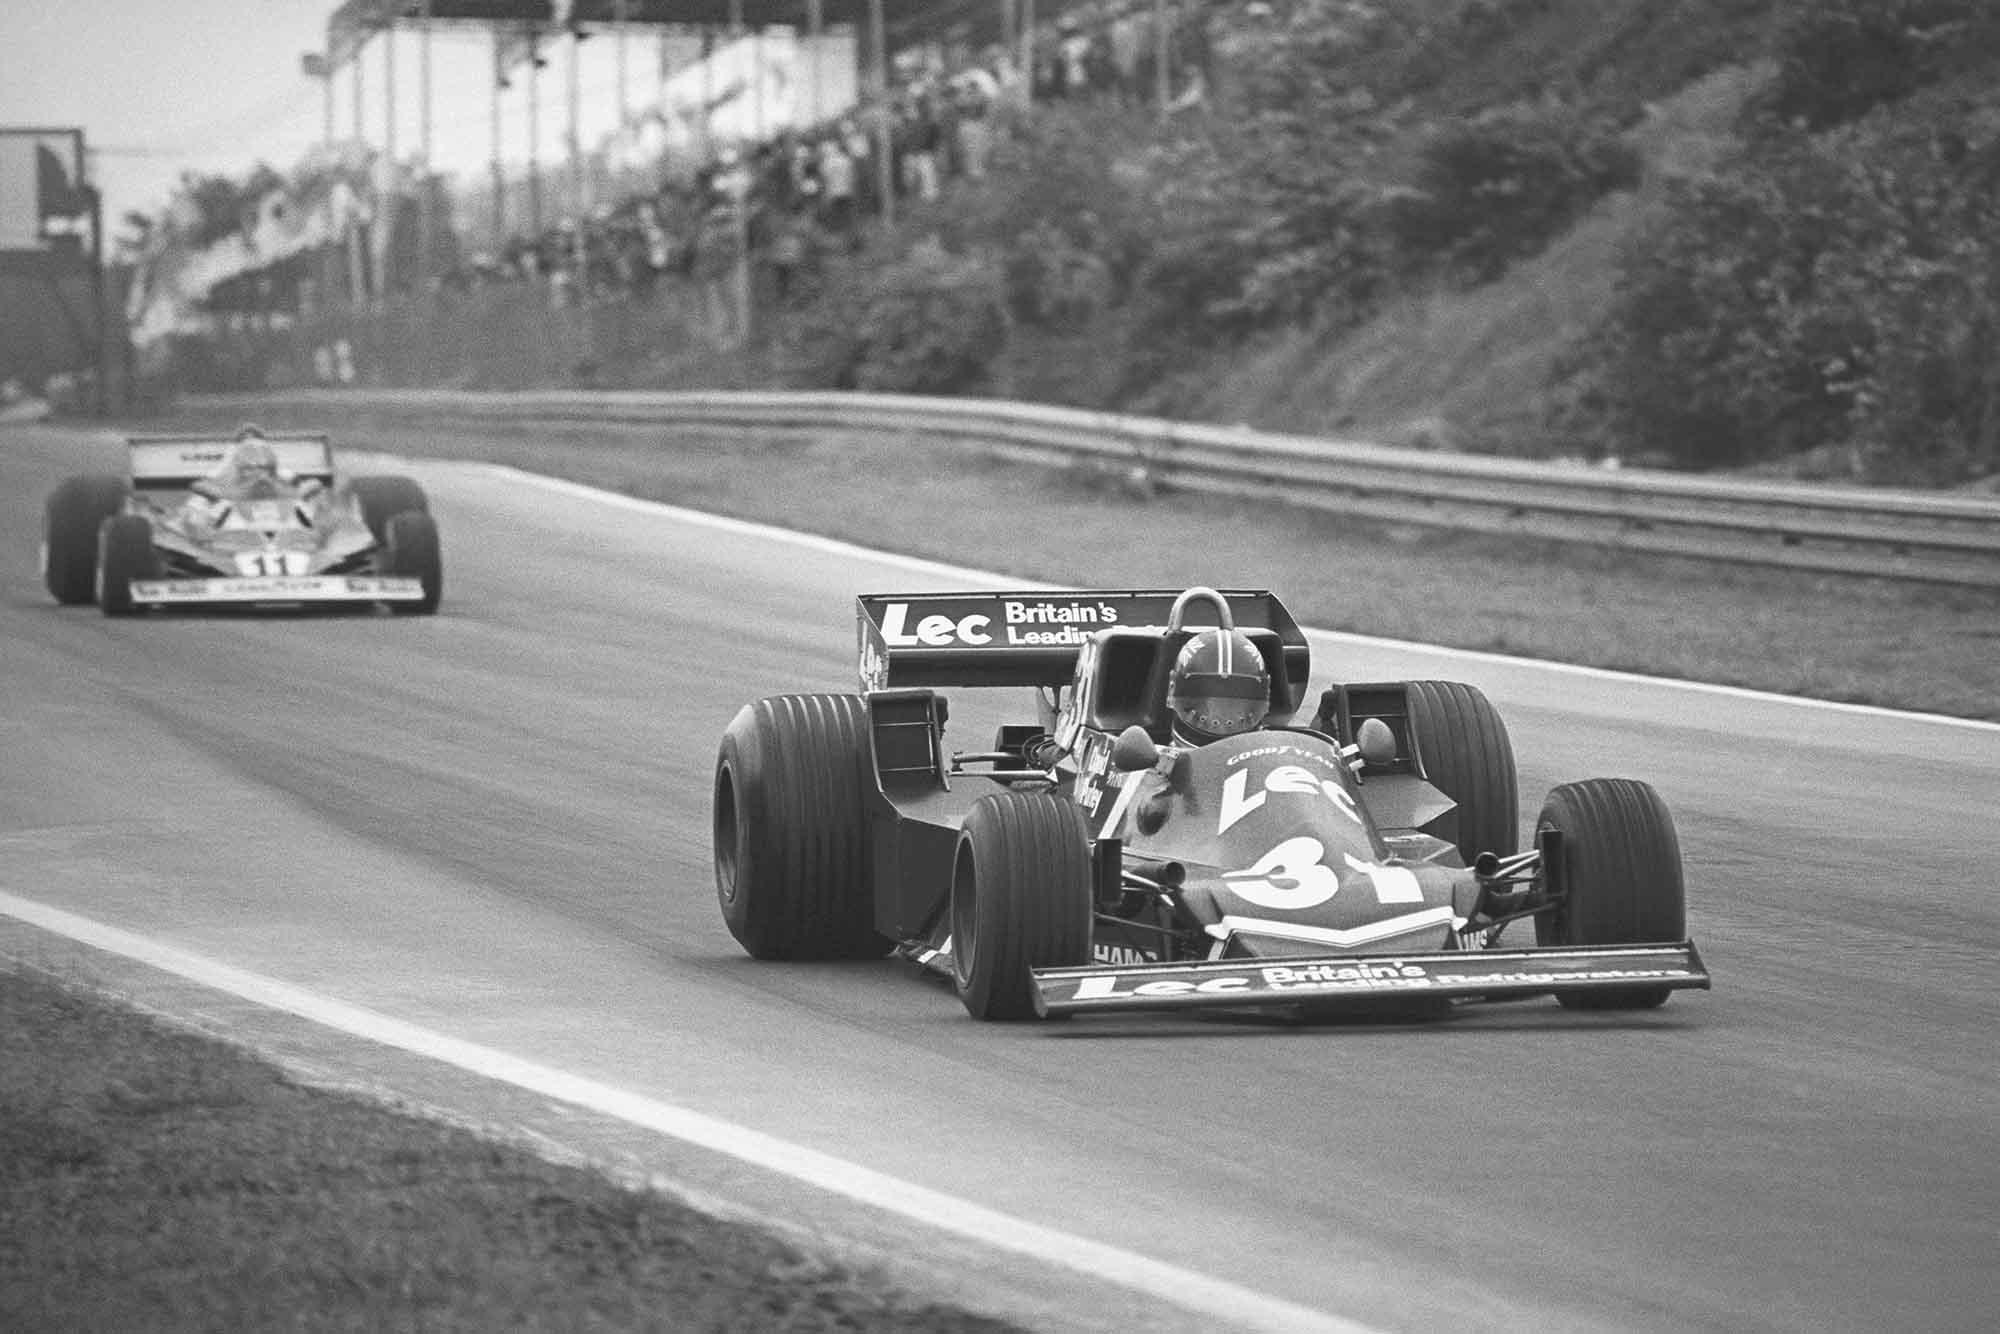 David Purley (LEC CRP1-Ford), 13th position, leads Niki Lauda (Ferrari 312T2), 2nd position at 1977 Belgium Grand Prix Zolder